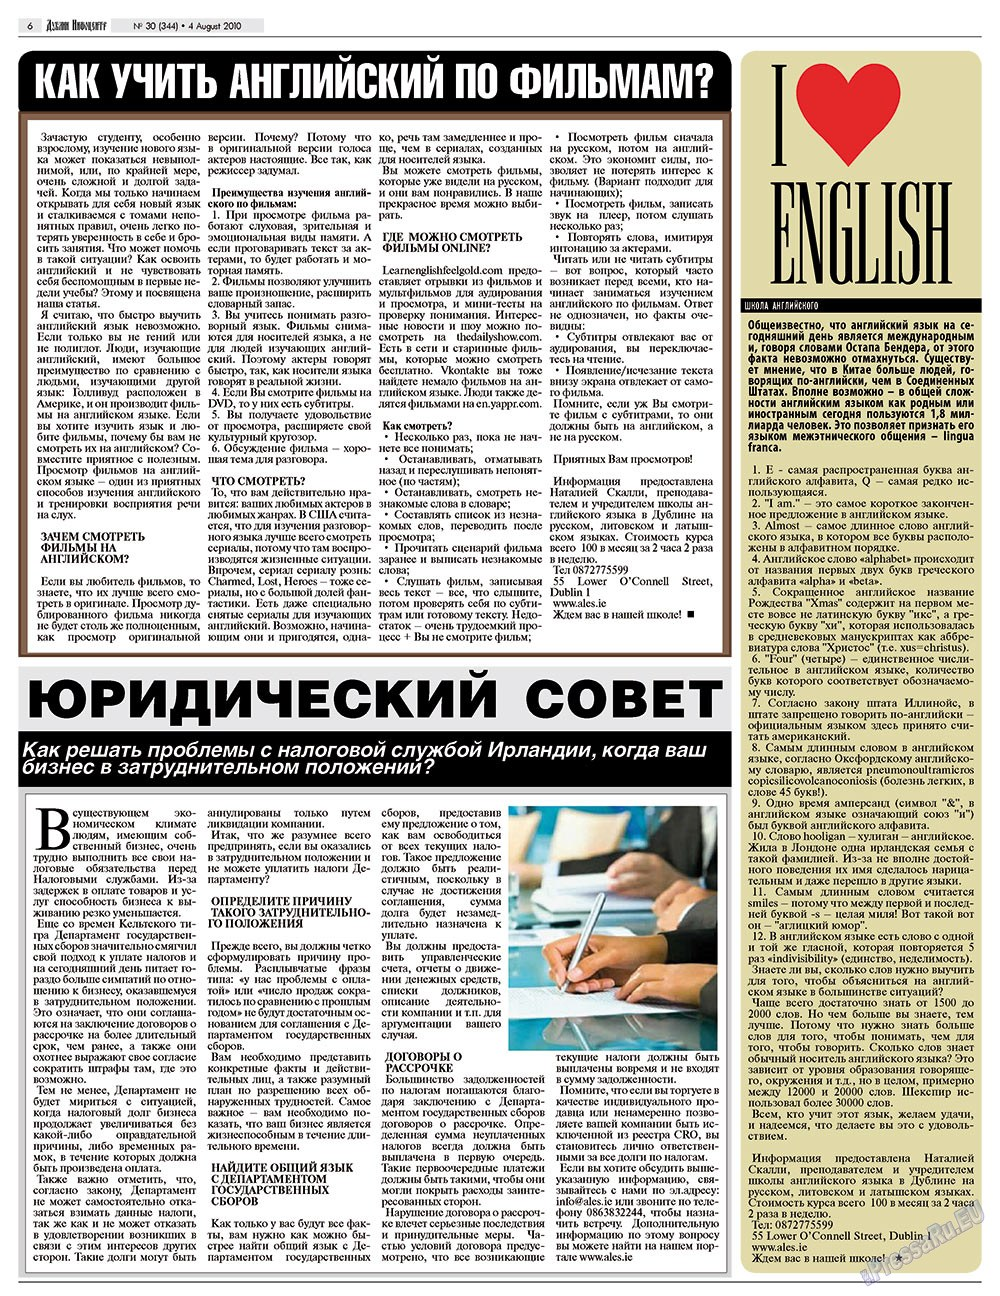 Дублин инфоцентр (газета). 2010 год, номер 30, стр. 6